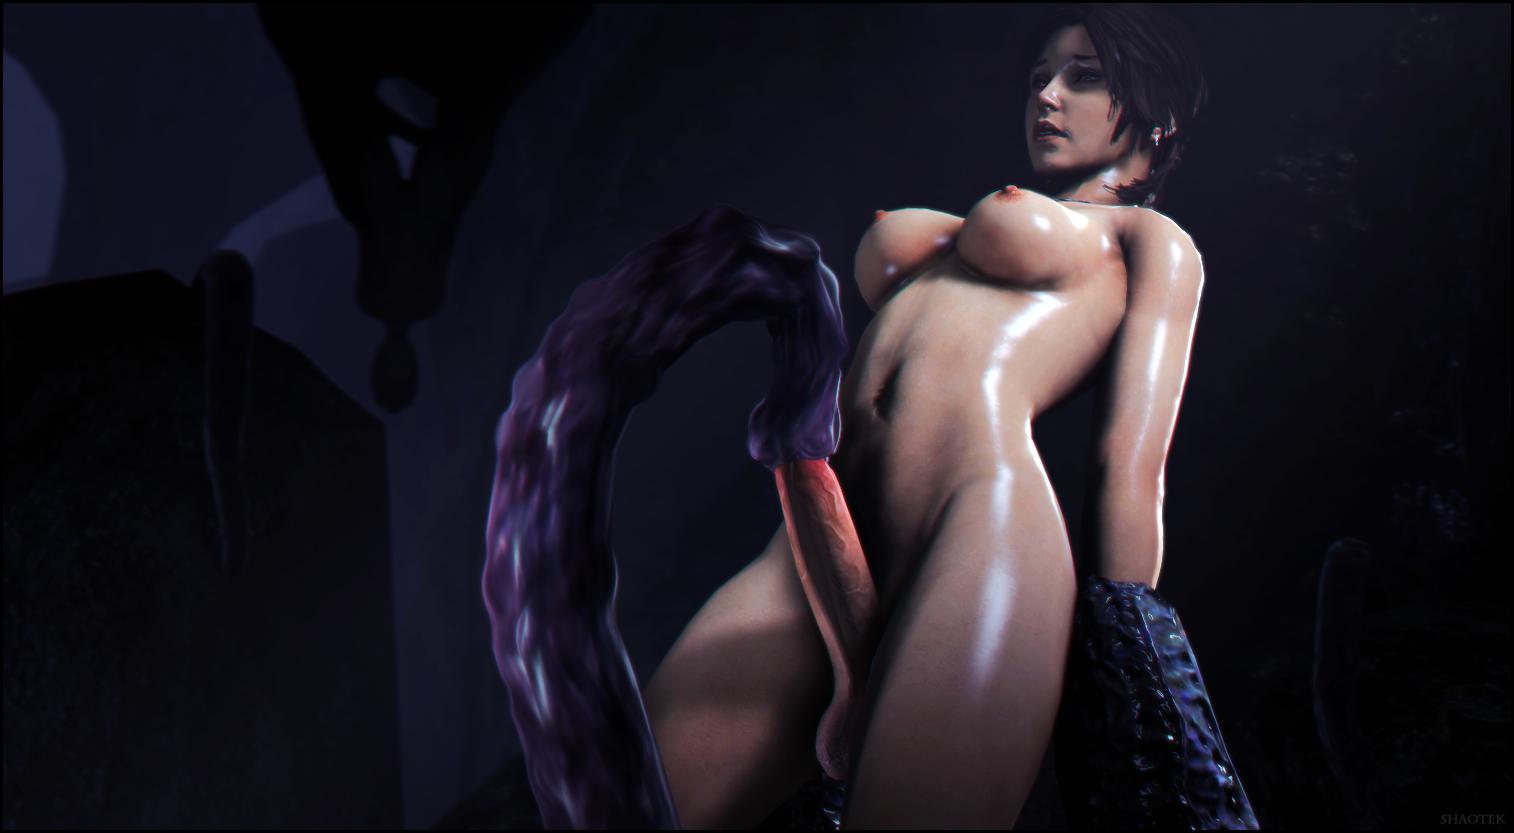 Heatseeker porn music video tomb raider